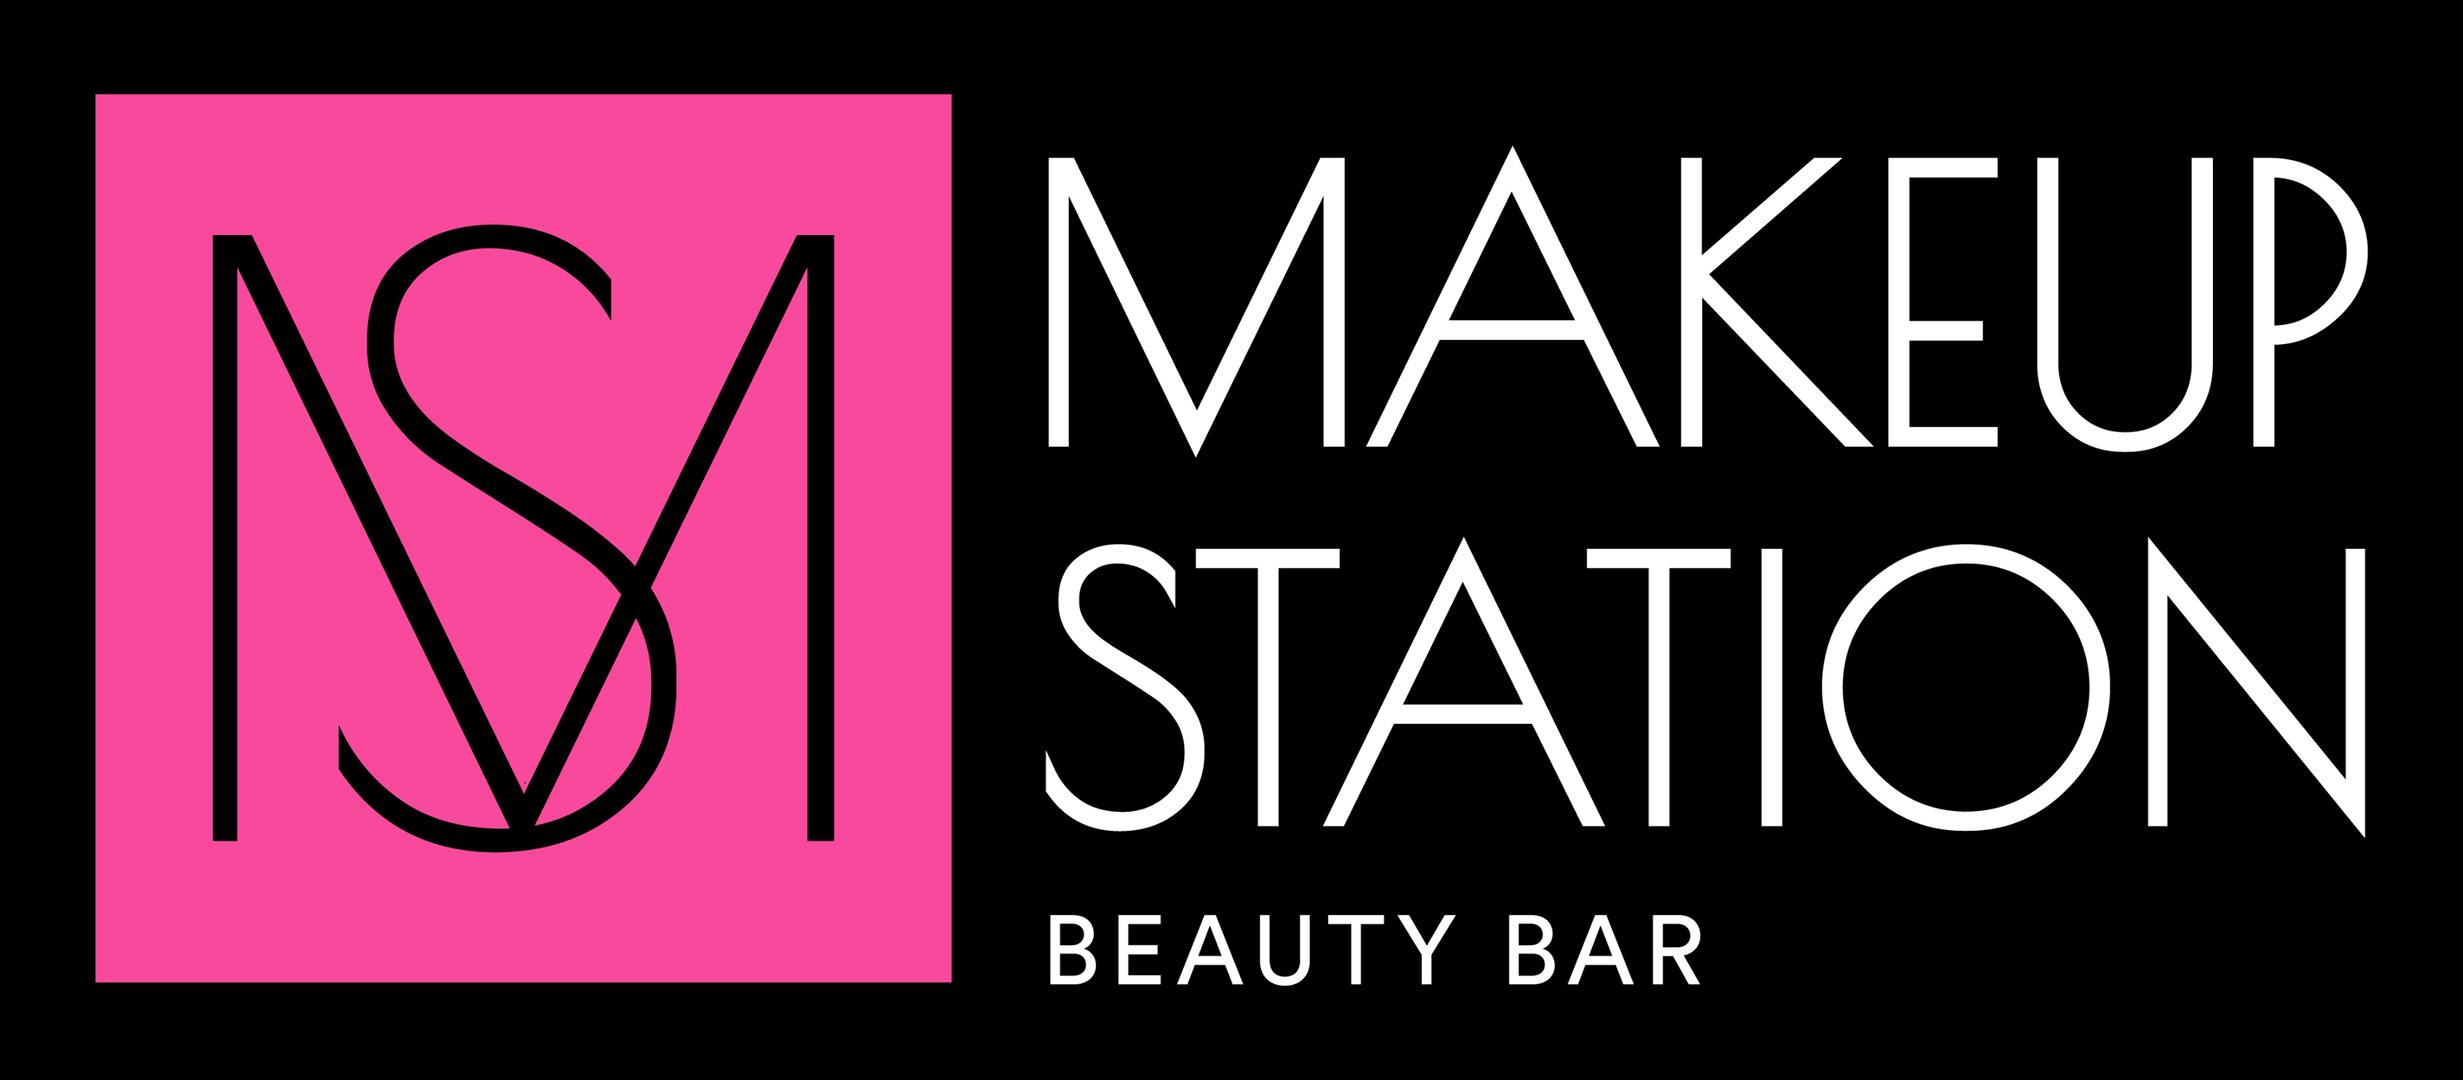 Makeup Station Beauty Bar